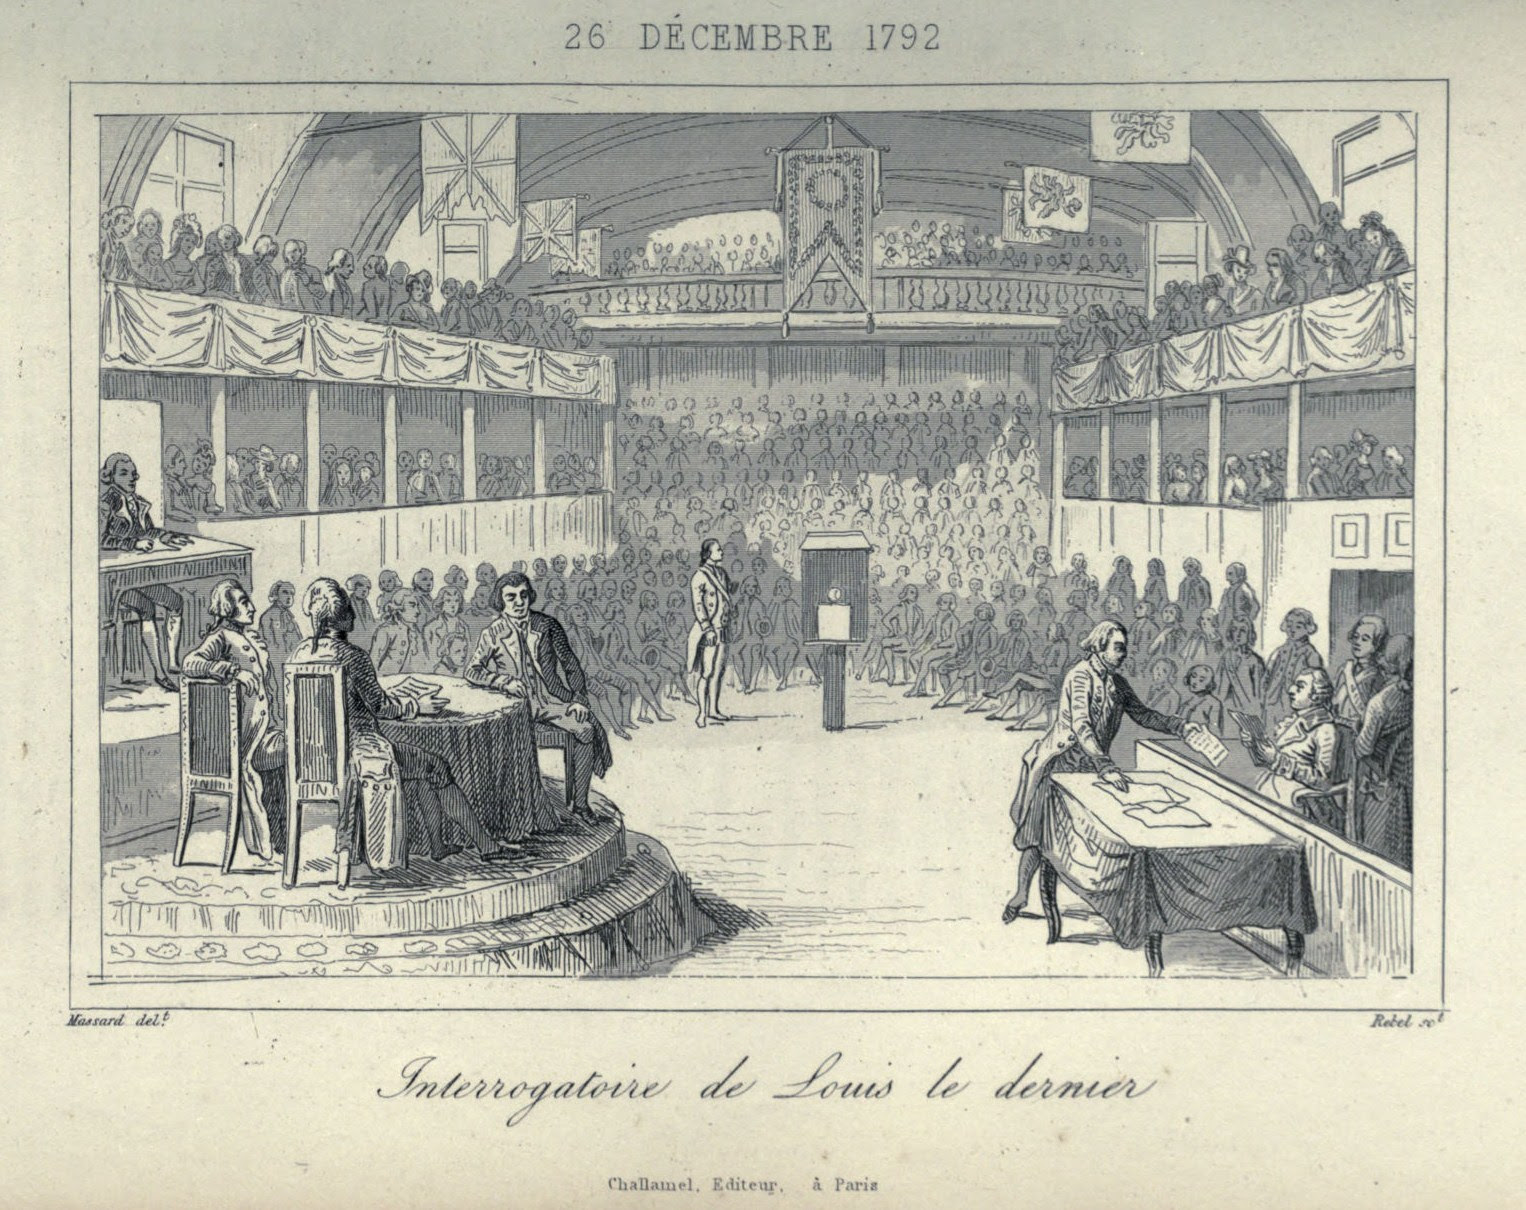 'Trial' of Louis XVI of France